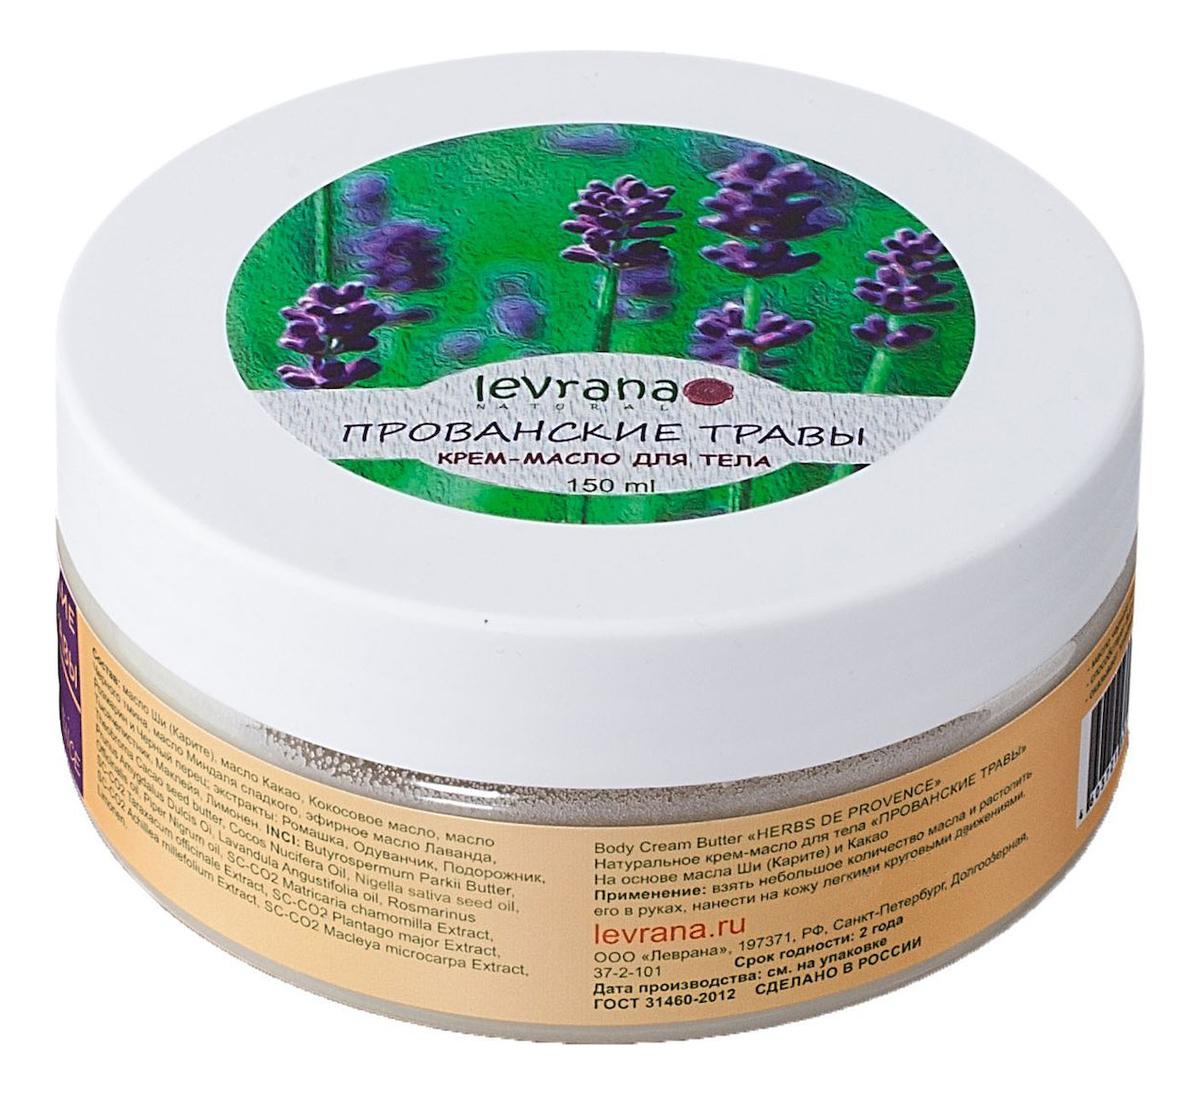 цена Крем-масло для тела Прованские травы Herbs De Provence Body Cream Butter 150мл онлайн в 2017 году